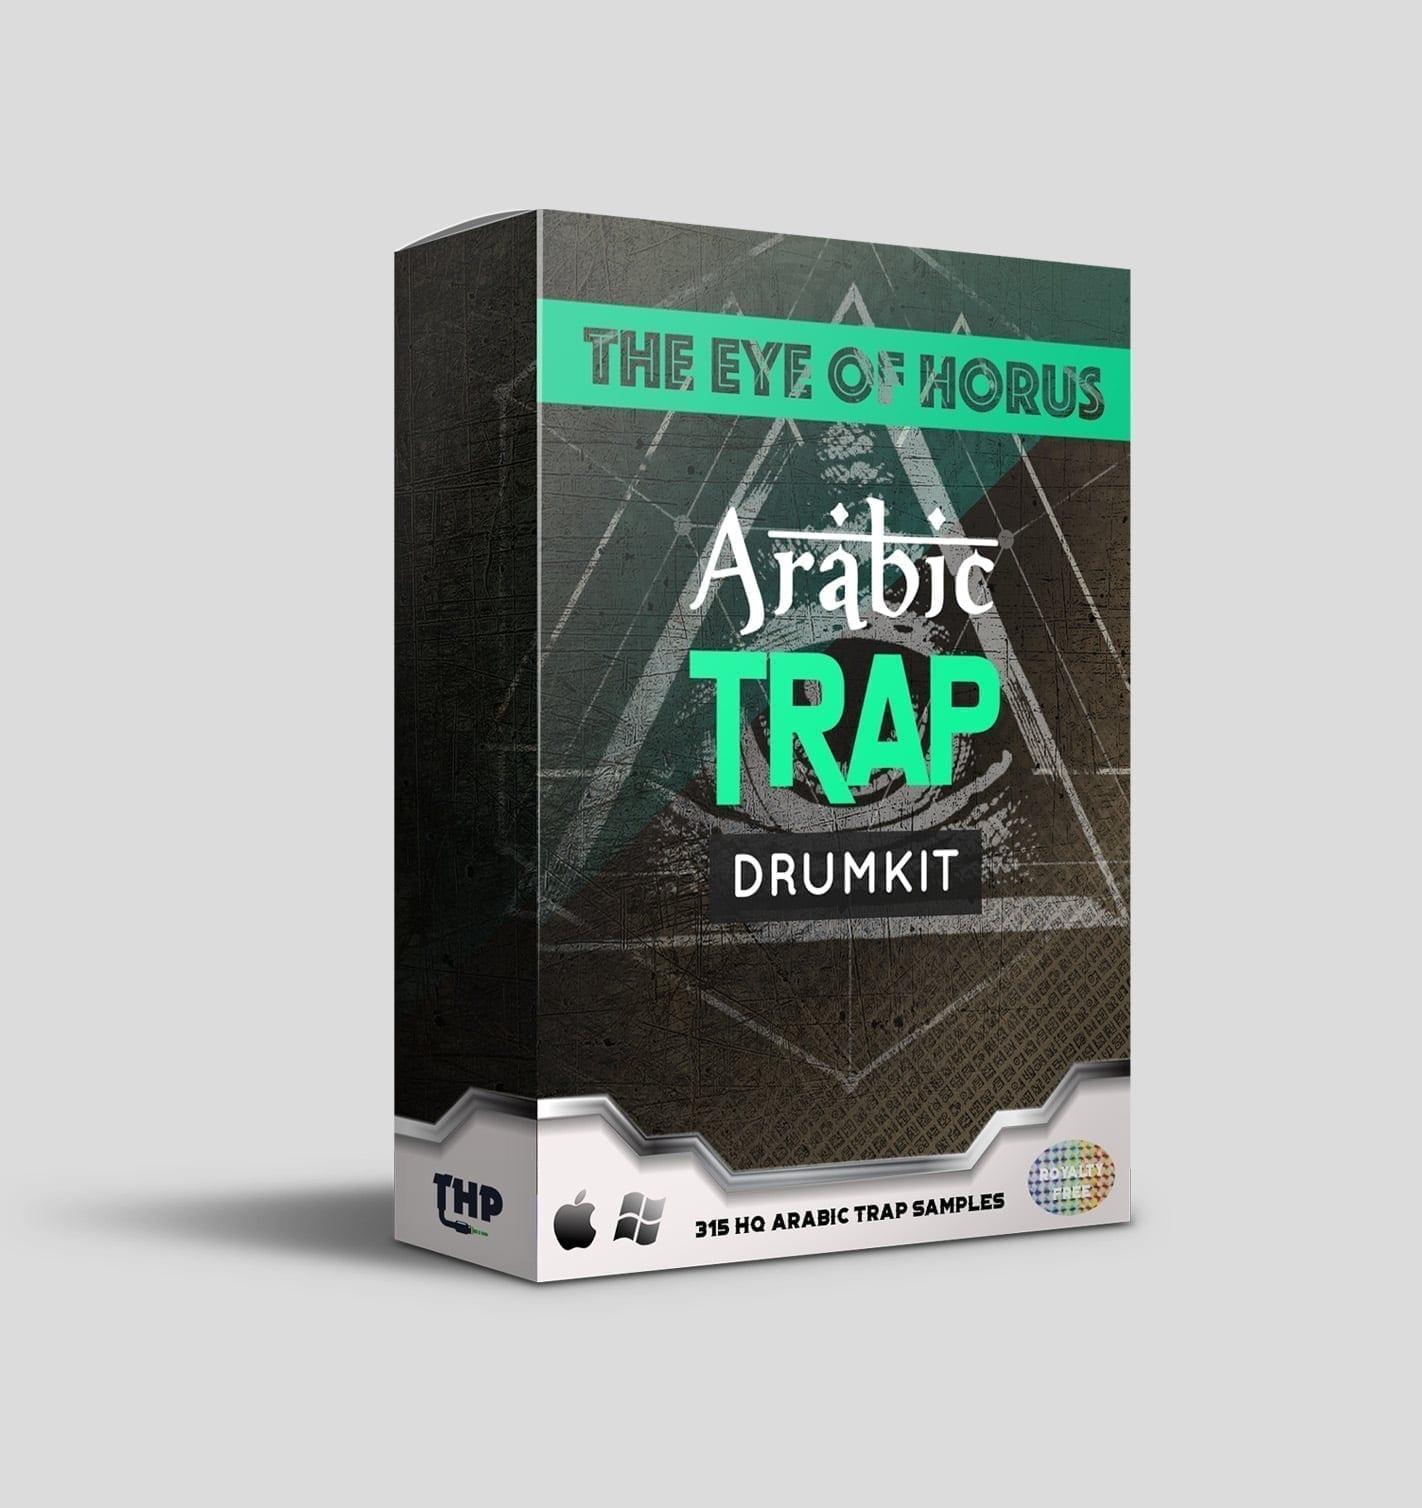 The Eye of Horus - Arabic Trap DrumKit